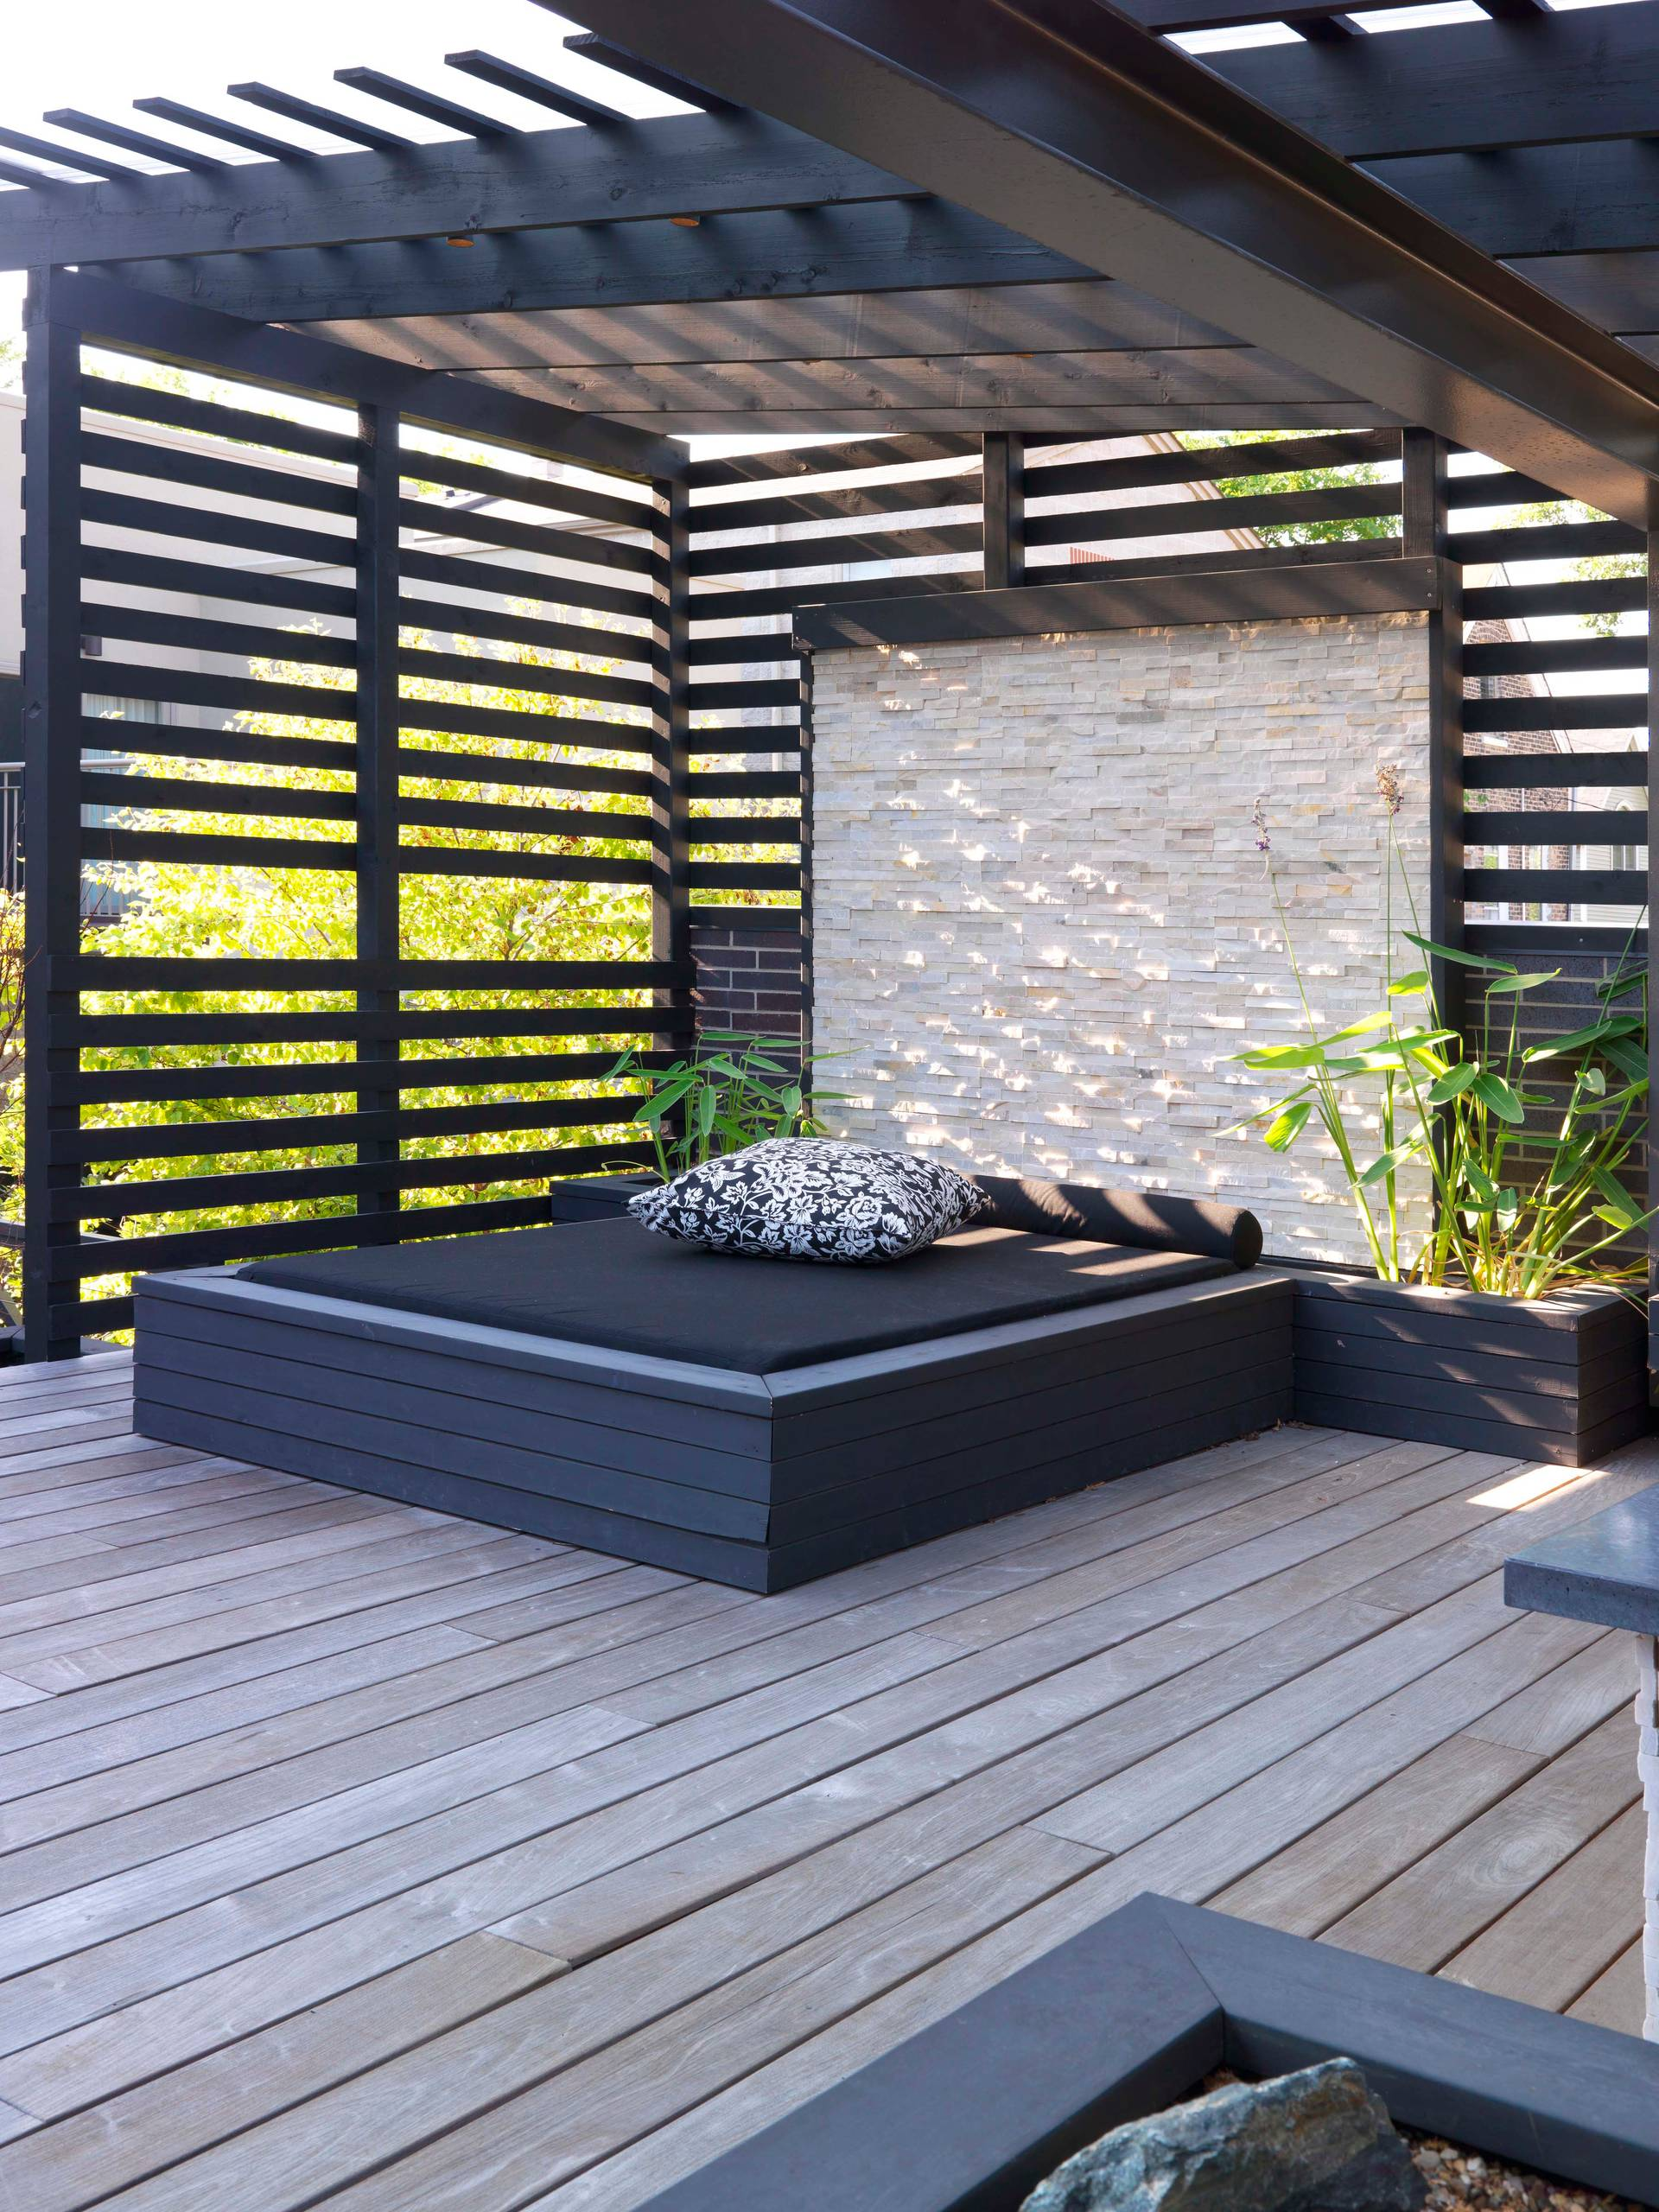 "Foto: Reprodução / <a href=""http://www.projectinteriors.com/"" target=""_blank"">PROjECT interiors + Aimee Wertepny </a>"